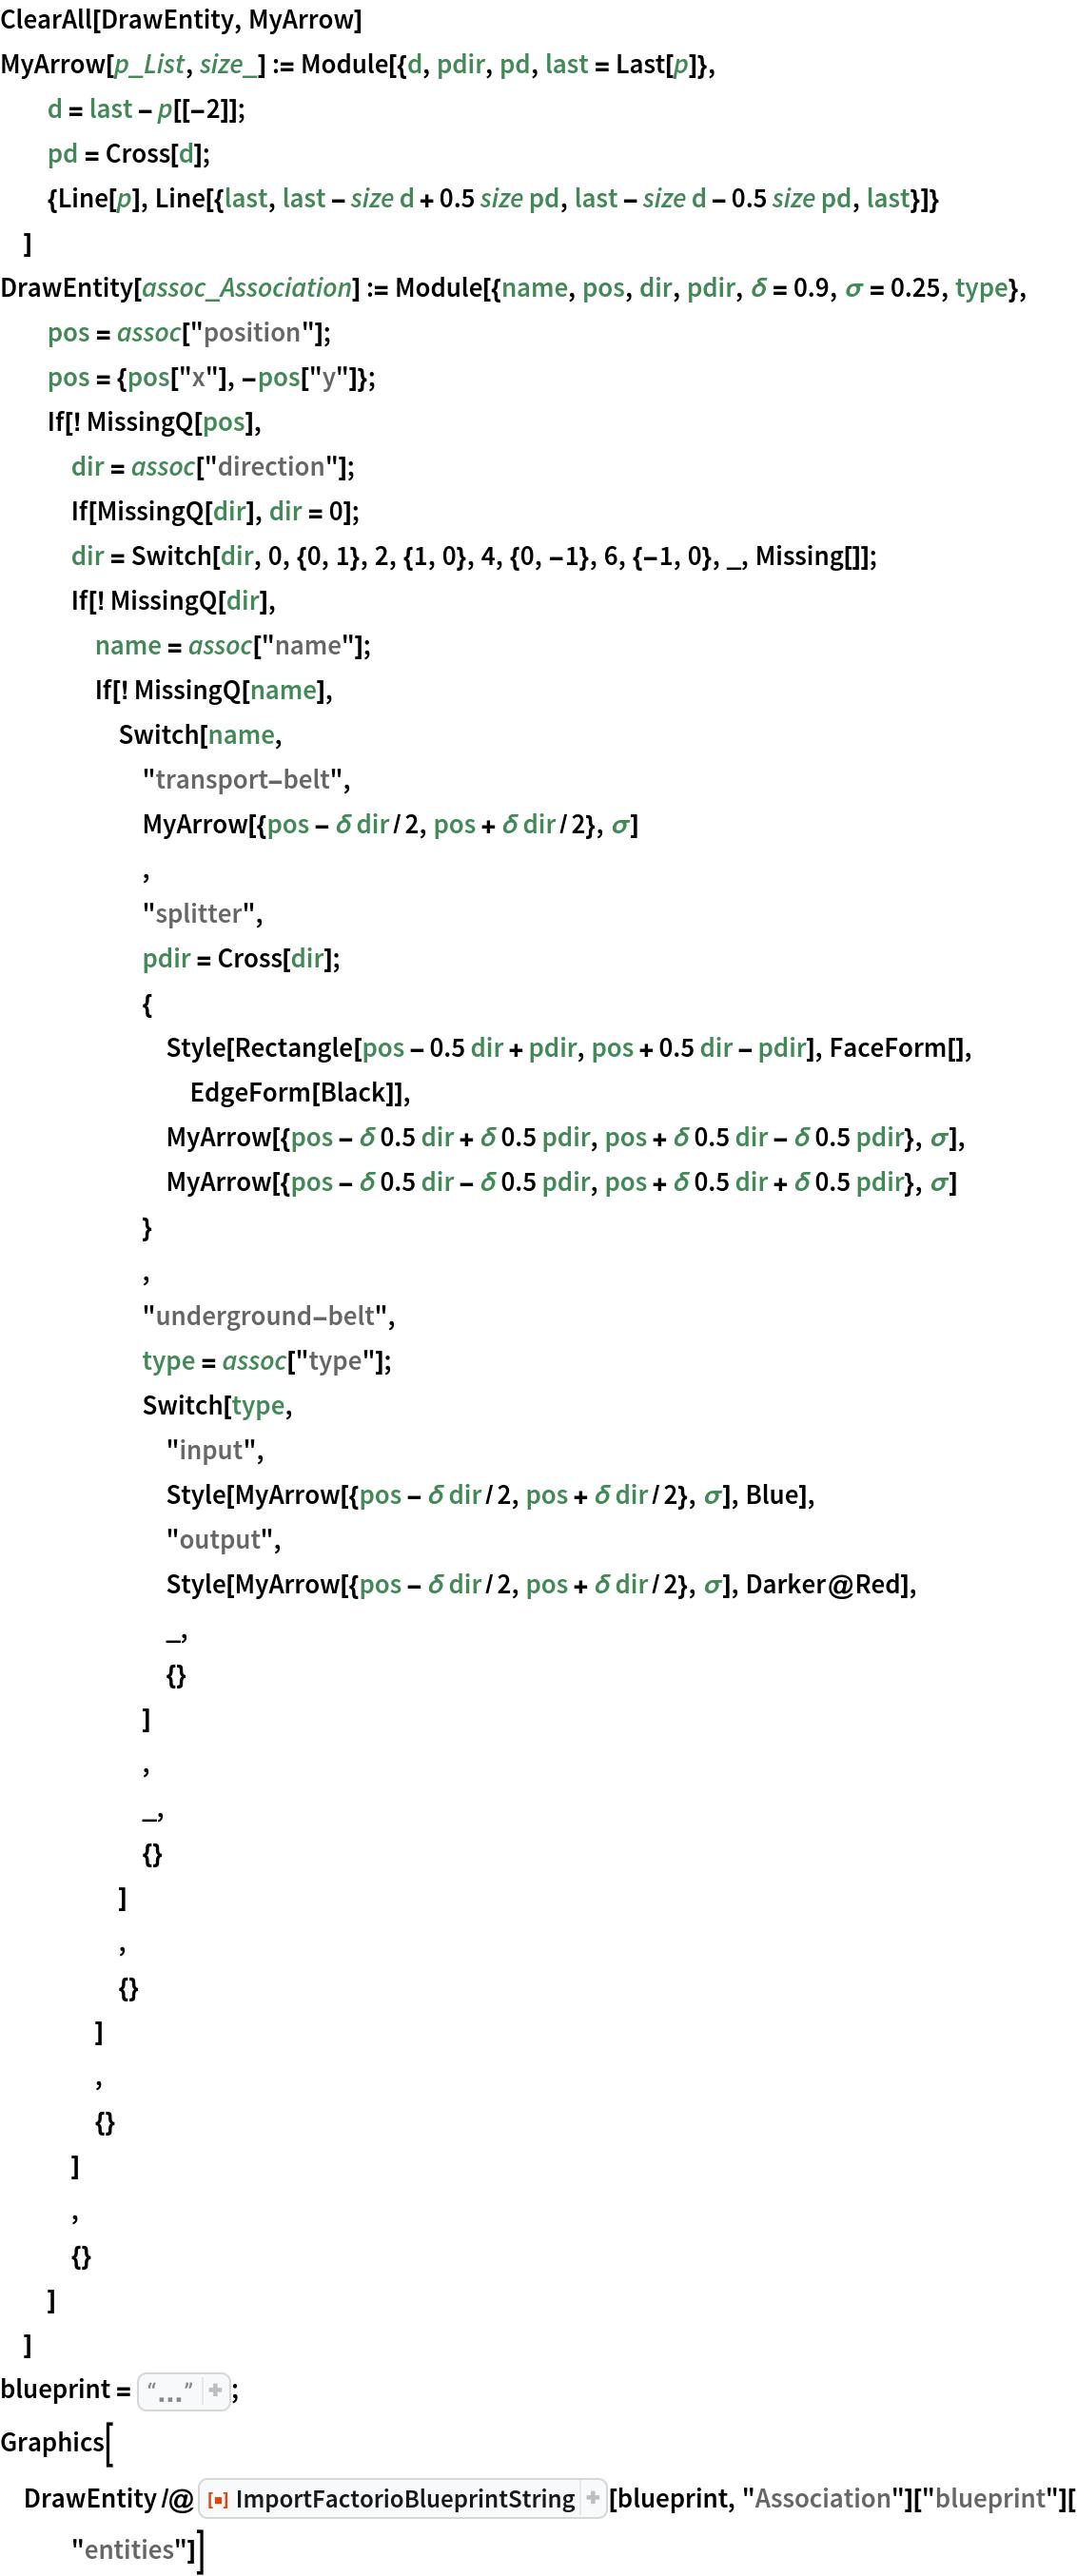 "ClearAll[DrawEntity, MyArrow] MyArrow[p_List, size_] := Module[{d, pdir, pd, last = Last[p]},   d = last - p[[-2]];   pd = Cross[d];   {Line[p], Line[{last, last - size d + 0.5 size pd, last - size d - 0.5 size pd, last}]}   ] DrawEntity[assoc_Association] := Module[{name, pos, dir, pdir, \[Delta] = 0.9, \[Sigma] = 0.25, type},   pos = assoc[""position""];   pos = {pos[""x""], -pos[""y""]};   If[! MissingQ[pos],    dir = assoc[""direction""];    If[MissingQ[dir], dir = 0];    dir = Switch[dir, 0, {0, 1}, 2, {1, 0}, 4, {0, -1}, 6, {-1, 0}, _, Missing[]];    If[! MissingQ[dir],     name = assoc[""name""];     If[! MissingQ[name],      Switch[name,       ""transport-belt"",       MyArrow[{pos - \[Delta] dir/2, pos + \[Delta] dir/2}, \[Sigma]]       ,       ""splitter"",       pdir = Cross[dir];       {        Style[Rectangle[pos - 0.5 dir + pdir, pos + 0.5 dir - pdir], FaceForm[], EdgeForm[Black]],        MyArrow[{pos - \[Delta] 0.5 dir + \[Delta] 0.5 pdir, pos + \[Delta] 0.5 dir - \[Delta] 0.5 pdir}, \[Sigma]],        MyArrow[{pos - \[Delta] 0.5 dir - \[Delta] 0.5 pdir, pos + \[Delta] 0.5 dir + \[Delta] 0.5 pdir}, \[Sigma]]        }       ,       ""underground-belt"",       type = assoc[""type""];       Switch[type,        ""input"",        Style[         MyArrow[{pos - \[Delta] dir/2, pos + \[Delta] dir/2}, \[Sigma]], Blue],        ""output"",        Style[         MyArrow[{pos - \[Delta] dir/2, pos + \[Delta] dir/2}, \[Sigma]], Darker@Red],        _,        {}        ]       ,       _,       {}       ]      ,      {}      ]     ,     {}     ]    ,    {}    ]   ] blueprint = ""0eNqdlt1ugzAMhd/\ F16wiDr95lWmaShtVkSCgEKahindfgG1CKx5priCQfBz72DJ3qOpBdkZpC+\ IO6tLqHsTrHXp10+d6fmbHToIAZWUDEehzM6+sOeu+\ a419qWRtYYpA6av8BMGm6PBw39XKWmk2x3B6i0Bqq6ySq4BlMb7roancTsEeT0fQtb070O\ r5Sw6Suk0jiKI8pdMs4w8CfRD8XwSnErCj5ZQuqNLduDivysjL+j7bASf+\ 4PgHHO9rTANQbB+V/aIGZ5O5mdZdDwOOl4C/nW8H2w1zgTzAc3+\ dSOYSd8CFP5gfJKAMQBG2sPiZZOKTyWQsoDI5oRQDKoj7OMO4TwviSkRCXRJQN1SkaYC/\ 3KefWRaQw4RQmQewUoJVBLV0sq1CpakiLJ+\ wlxC"